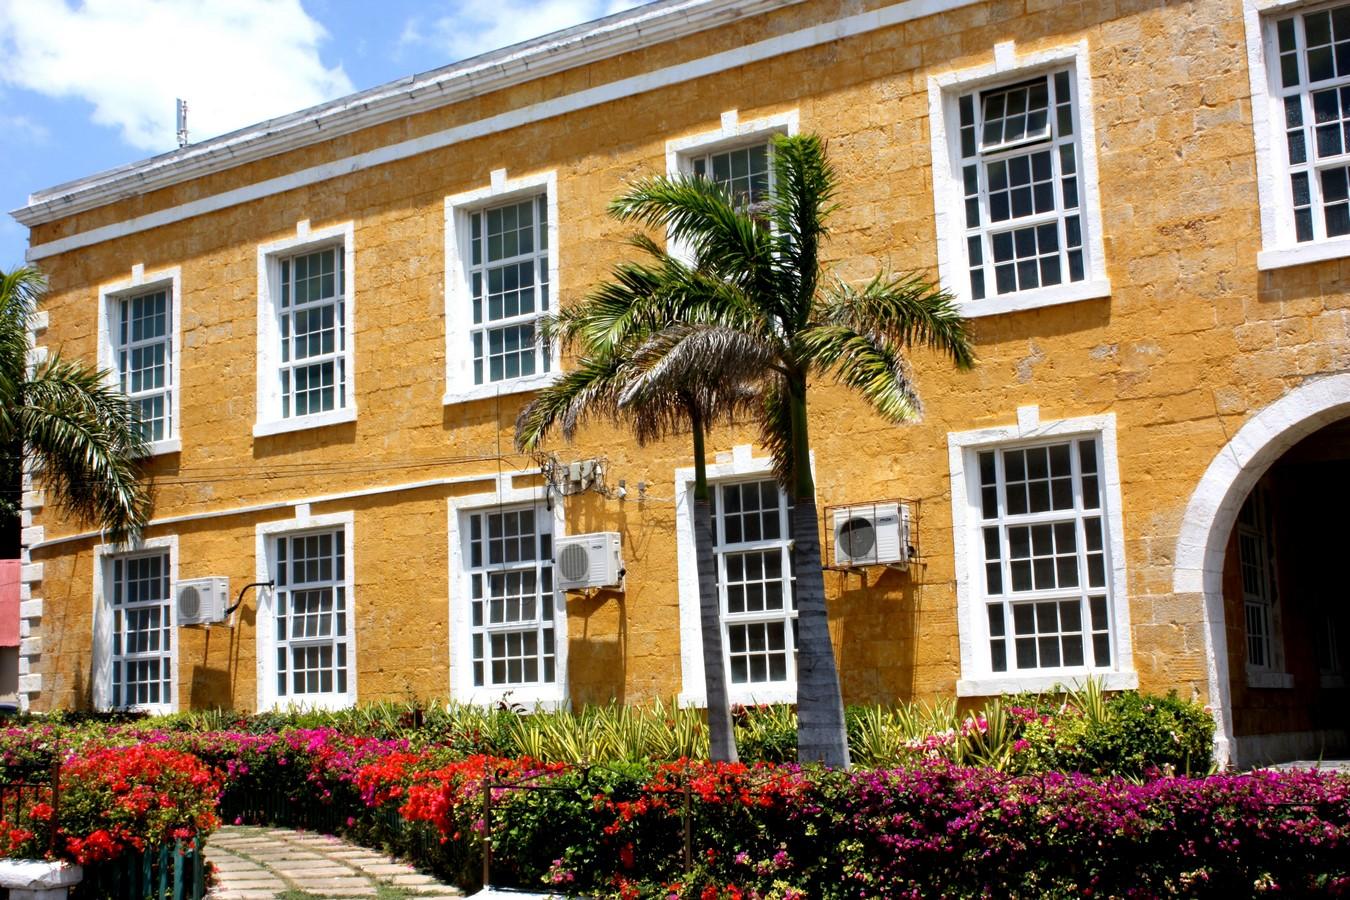 Falmouth courthouse - Sheet2